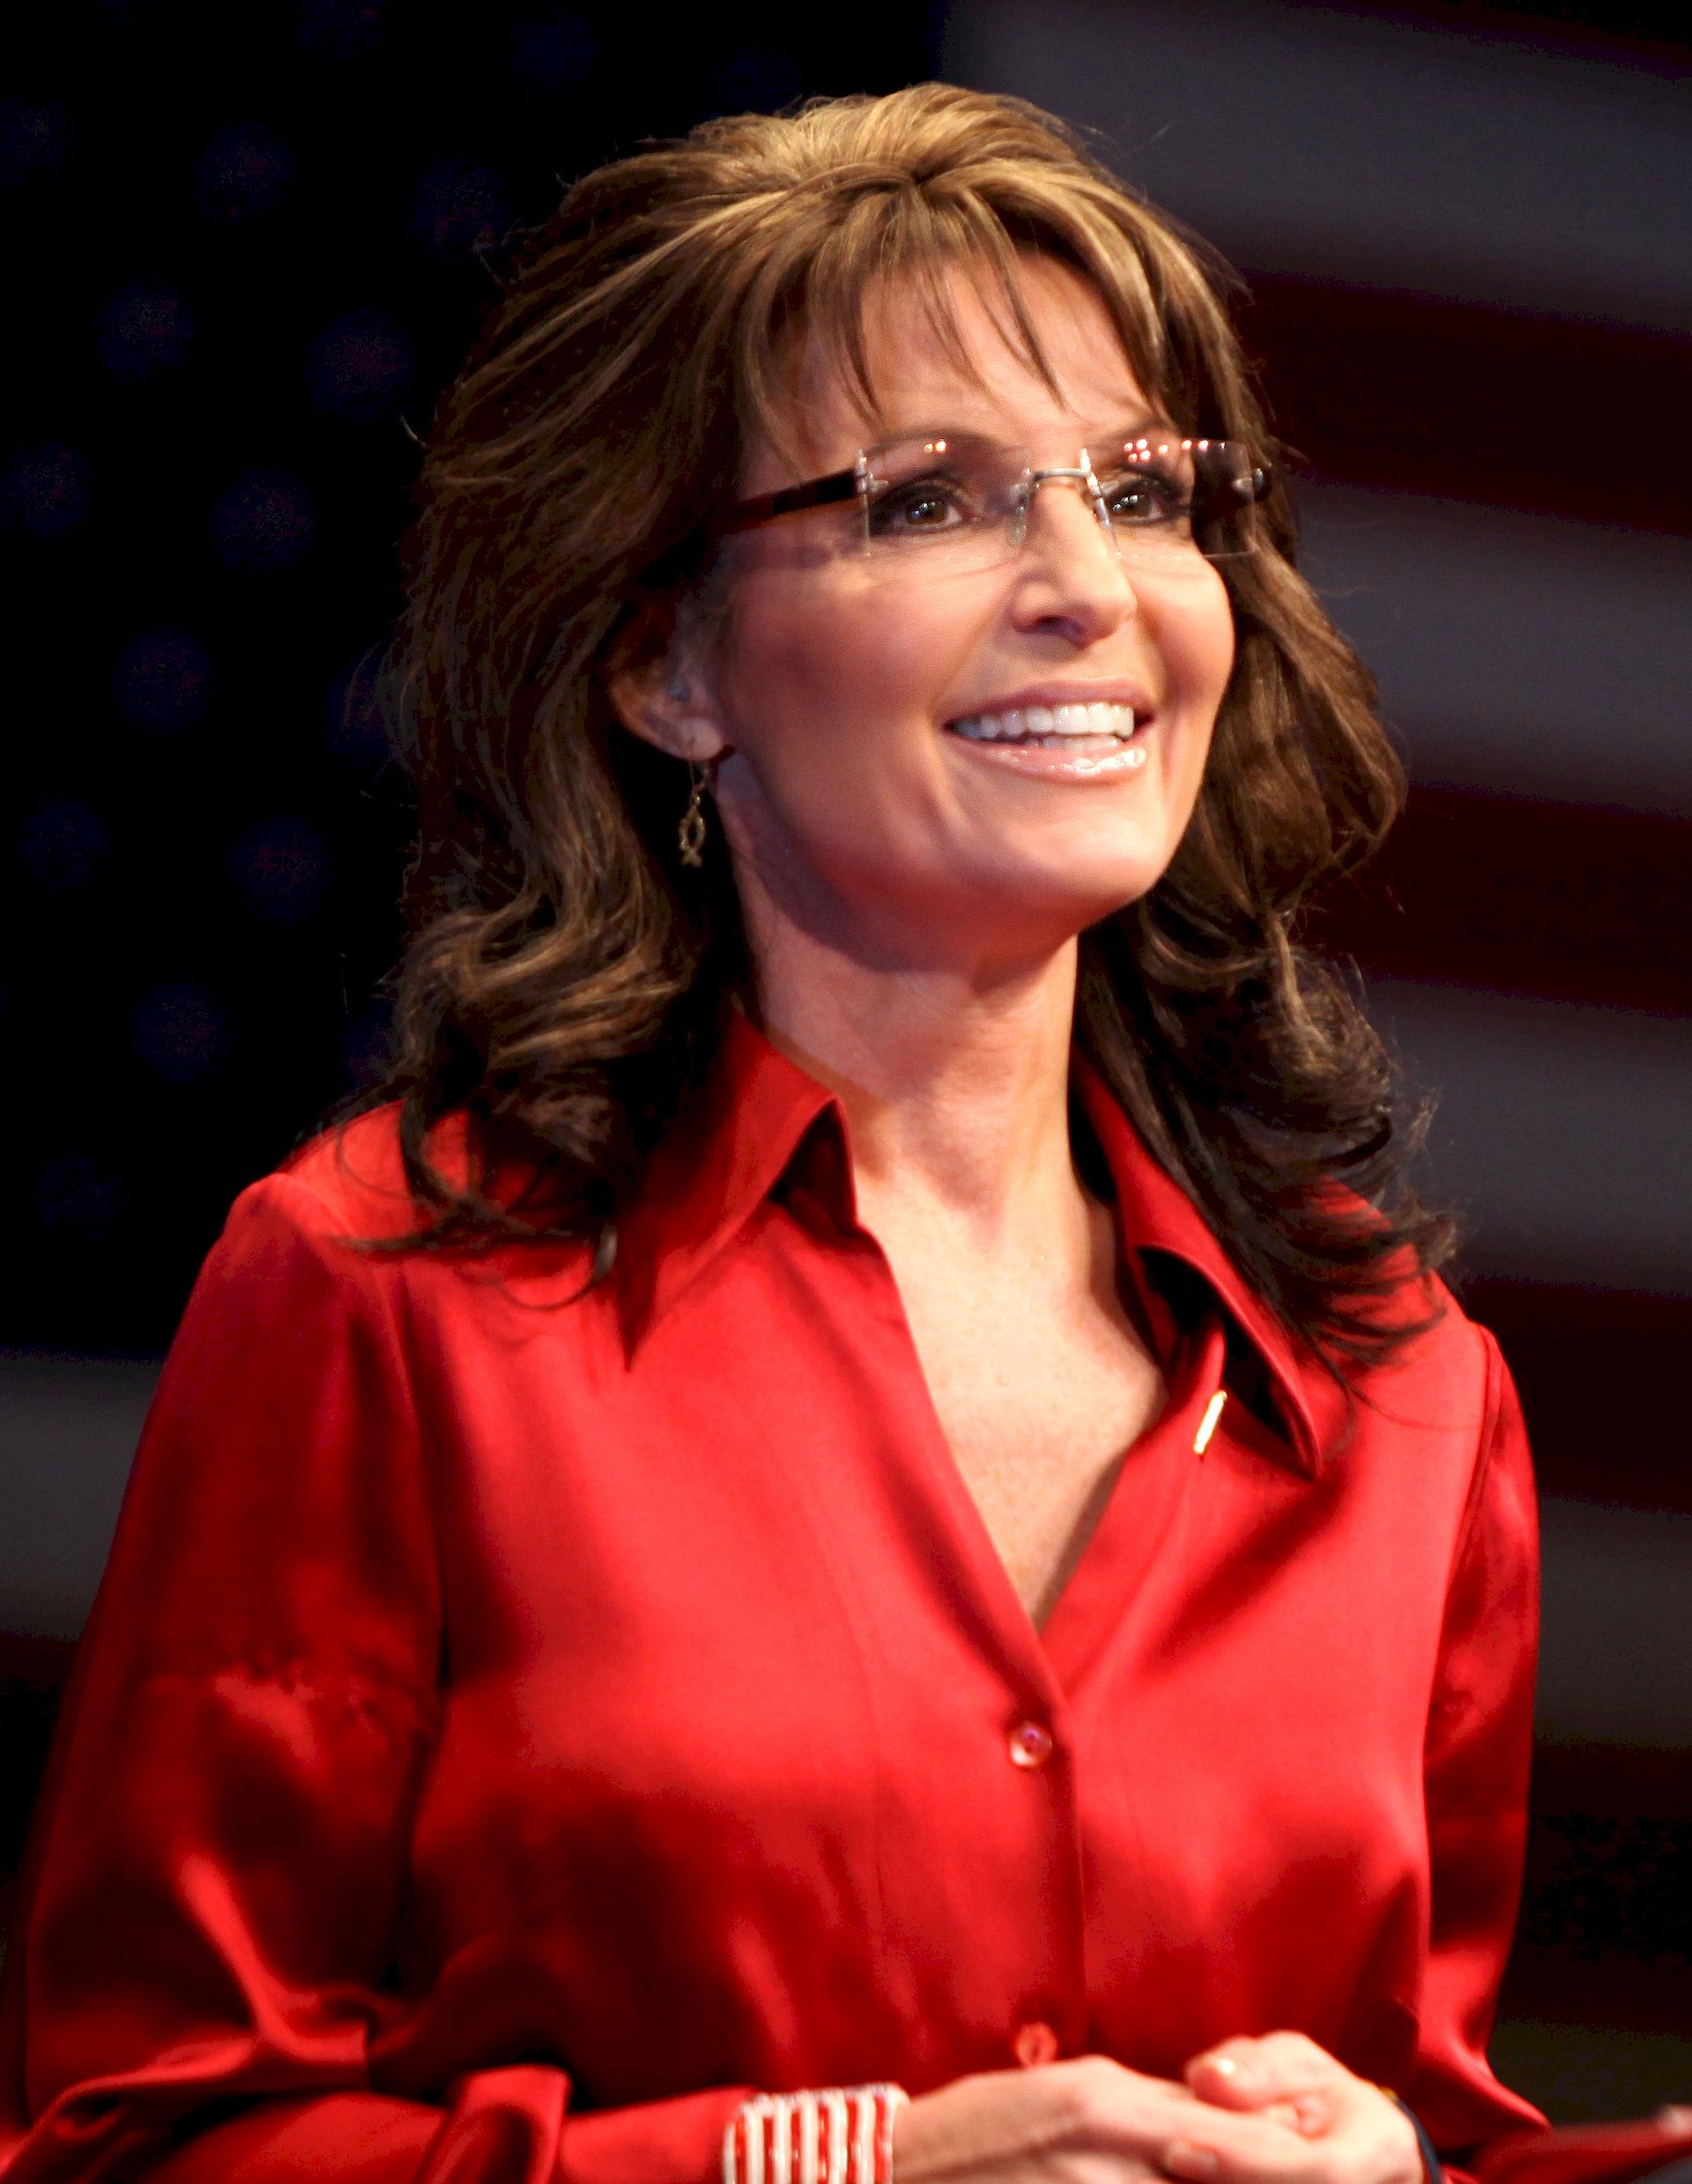 Photo of Sarah Palin: American politician